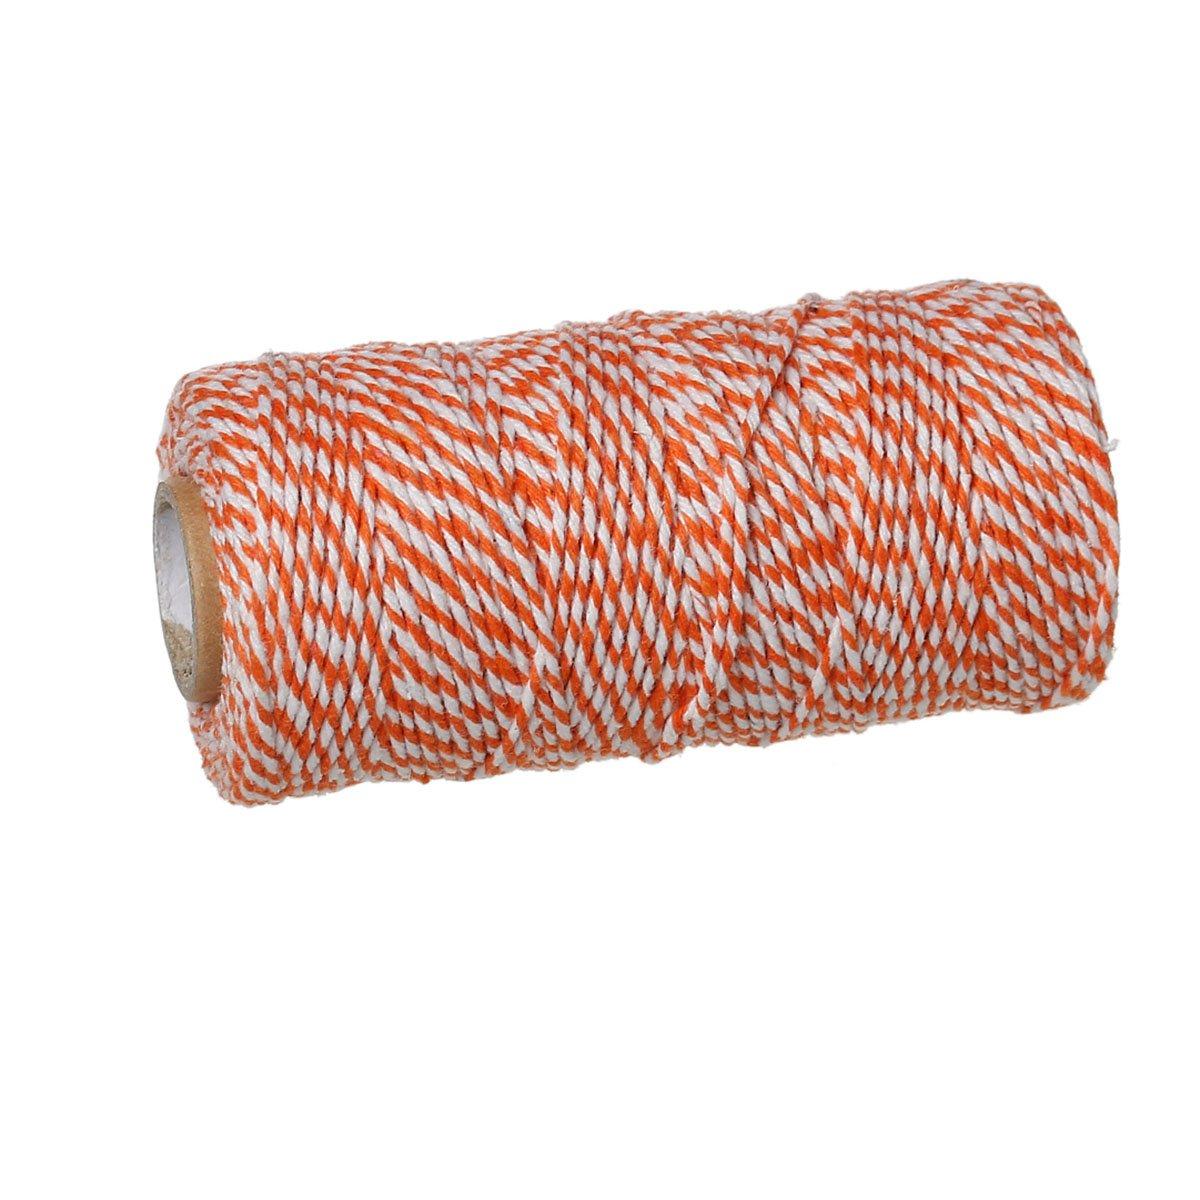 wei/ß gestreift 92m Schnur aus Baumwolle grau 1,5mm dick SiAura Material /®